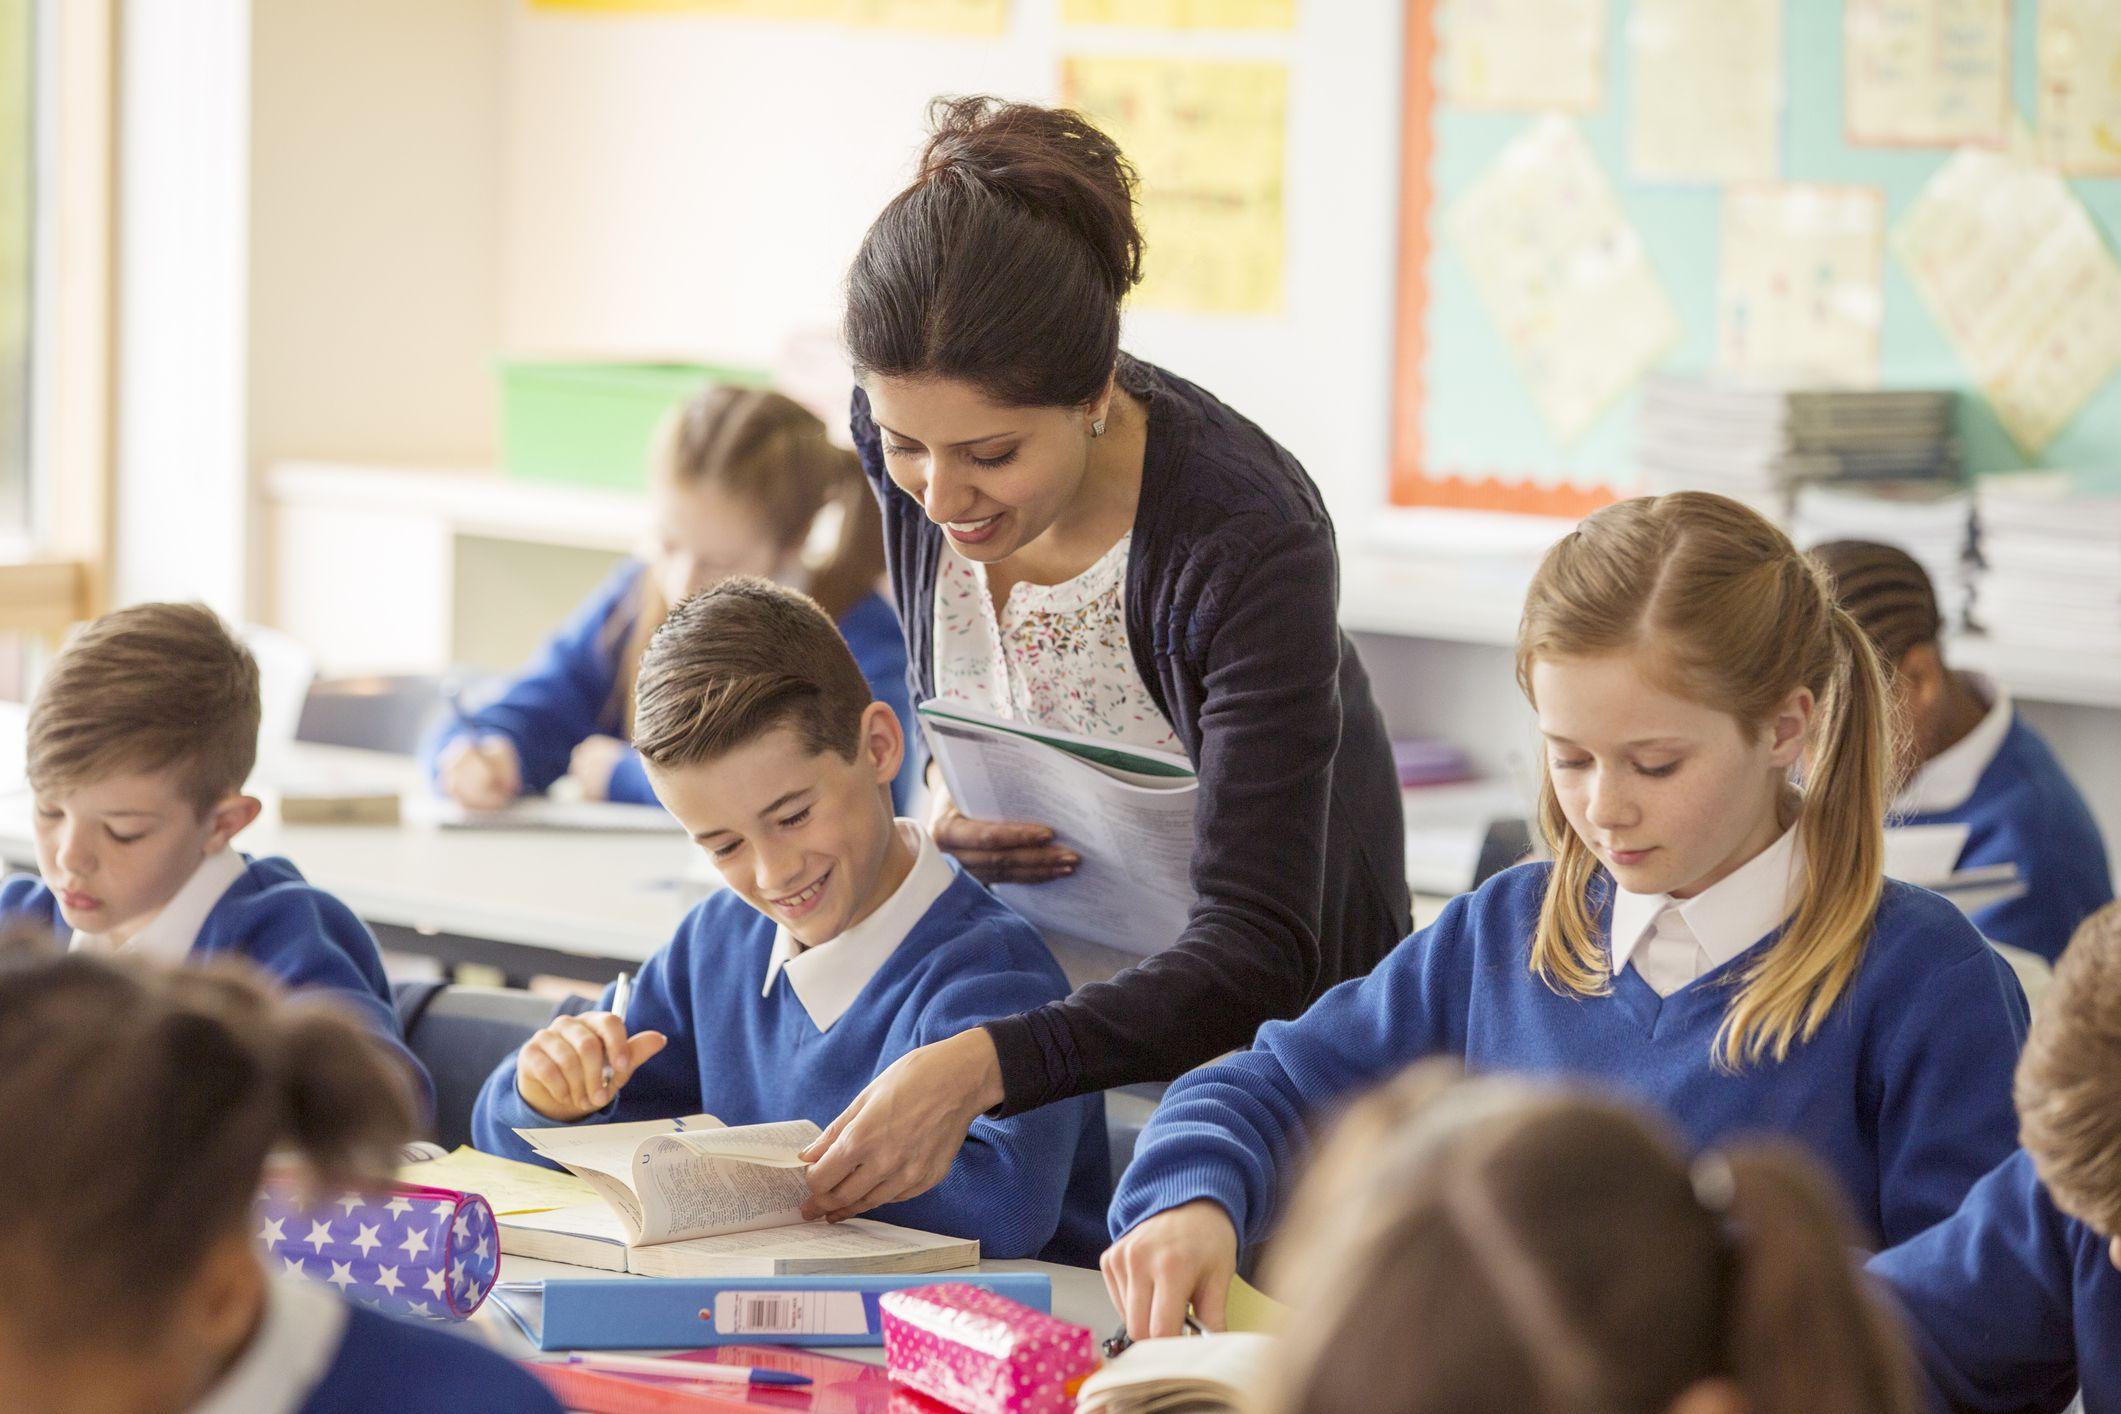 interview questions for kindergarten teachers